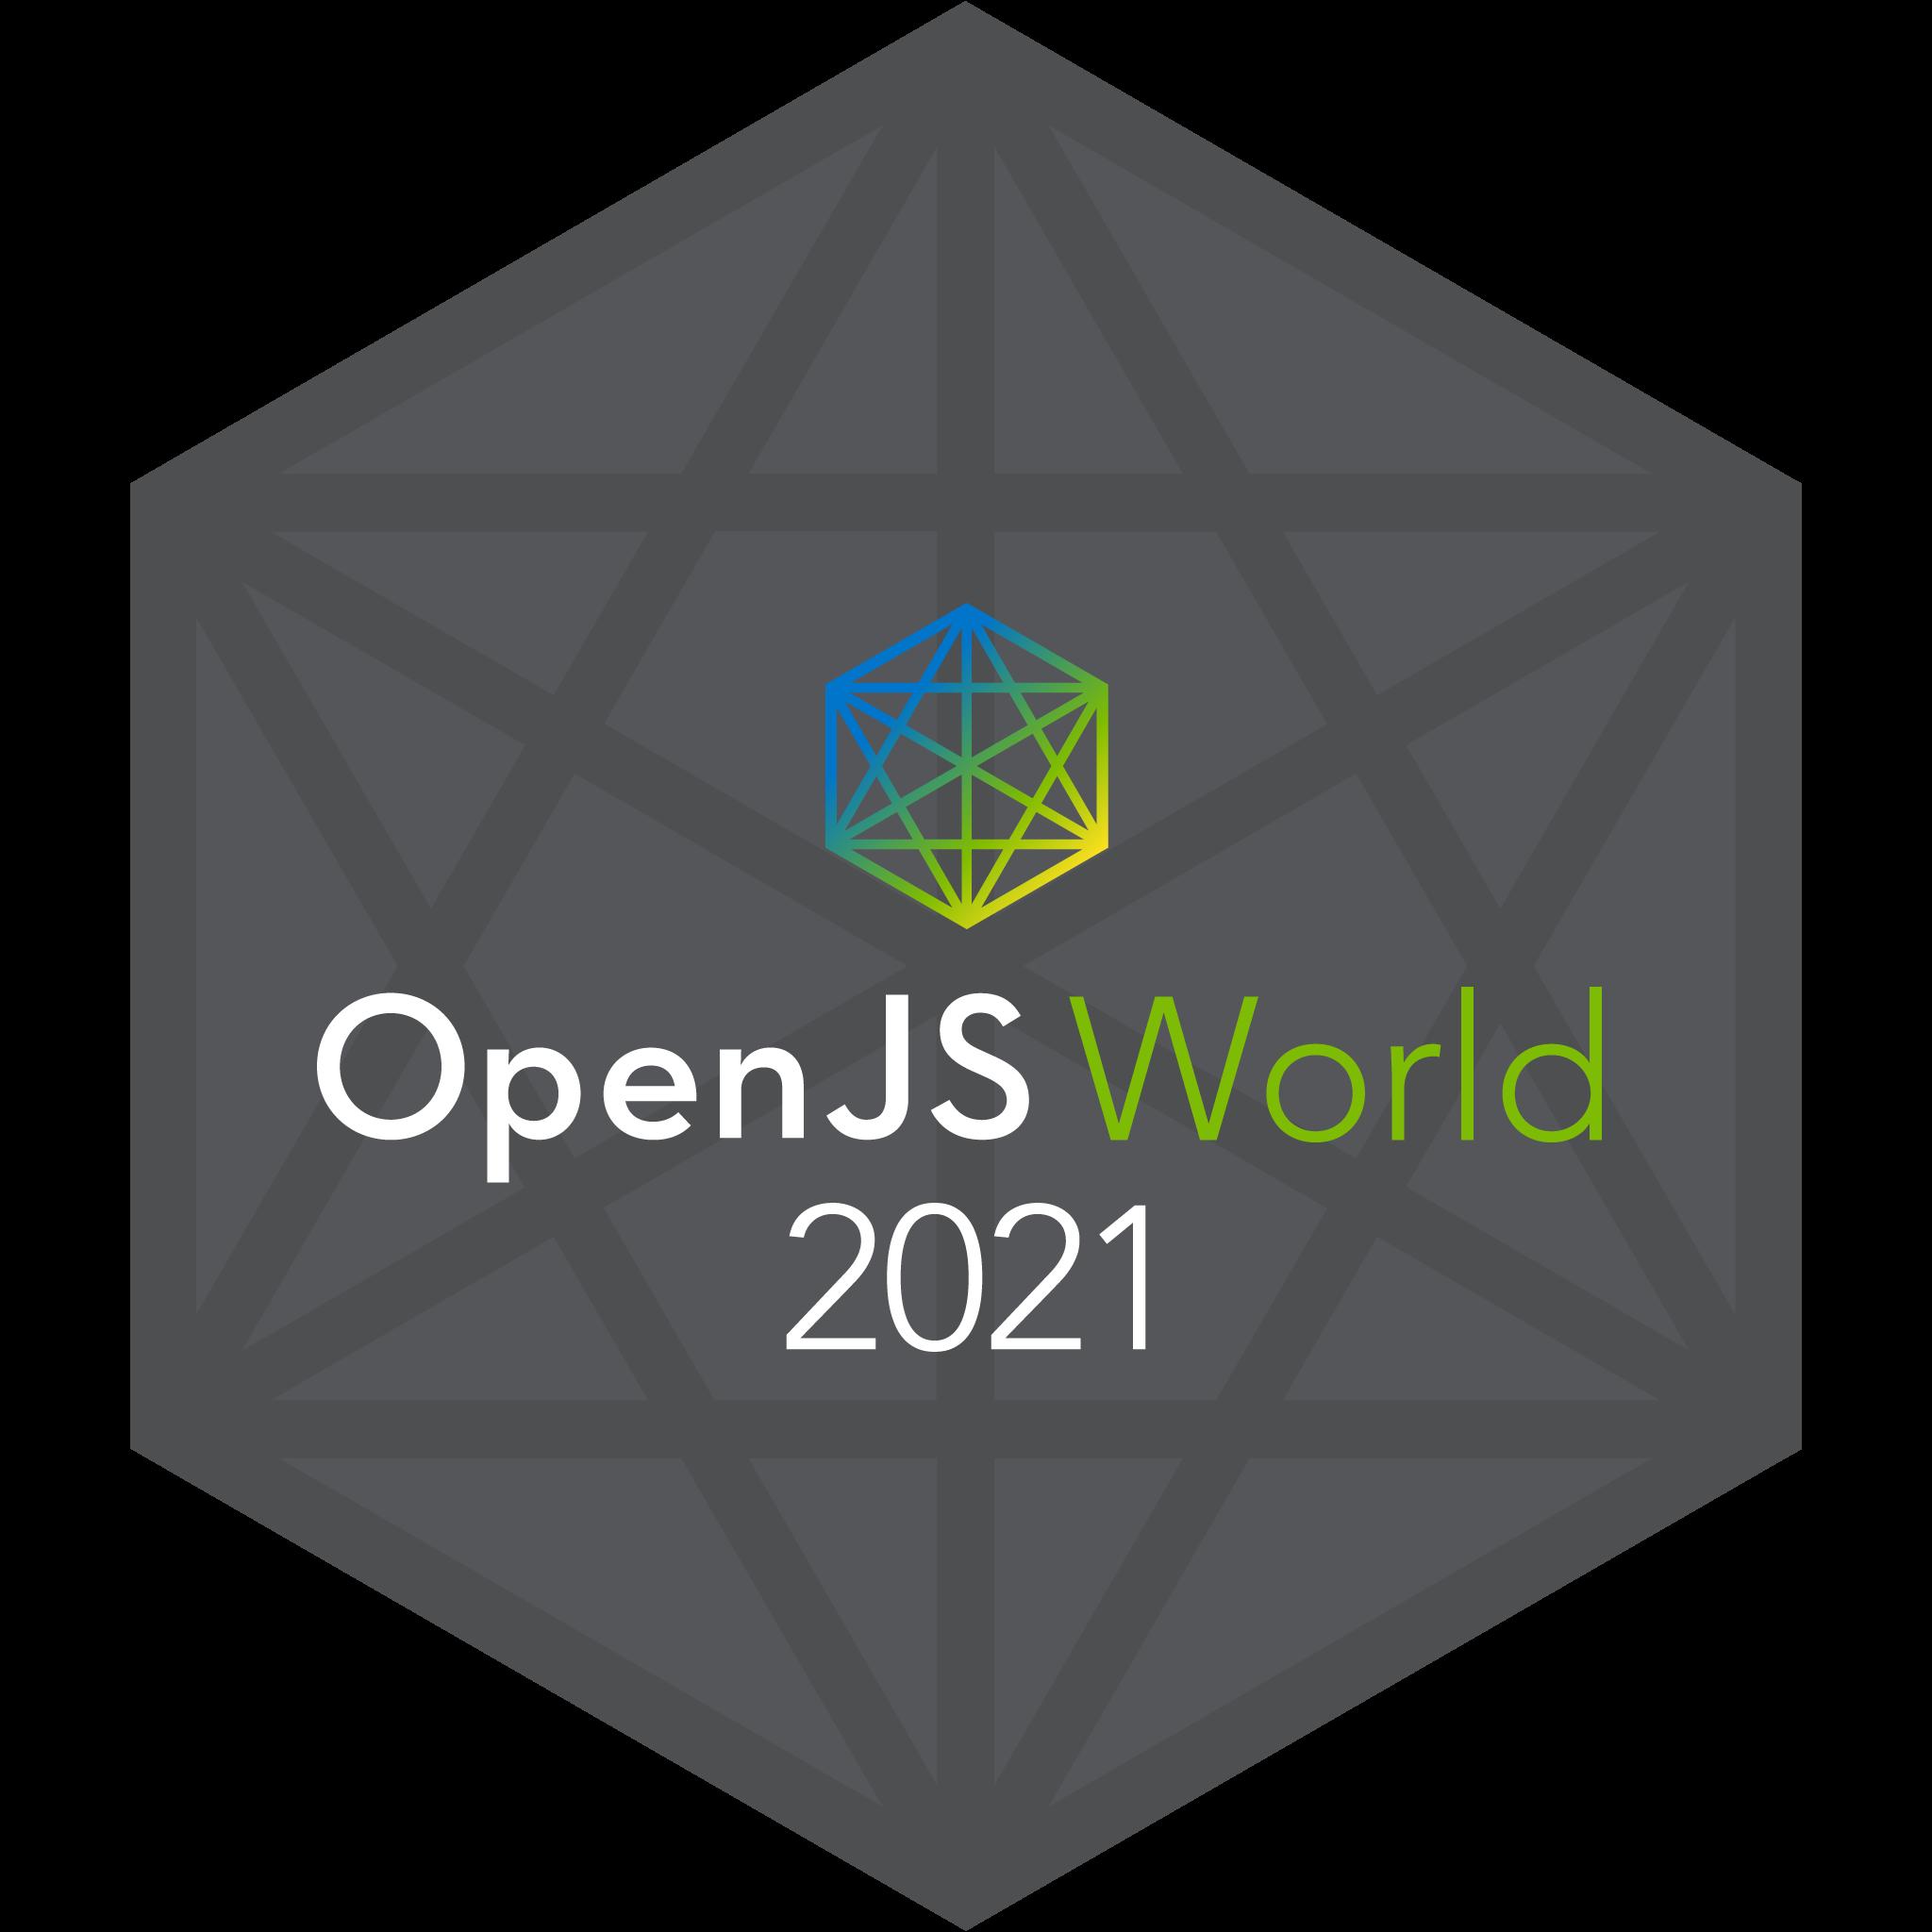 OpenJS Foundation: OpenJS World 2021